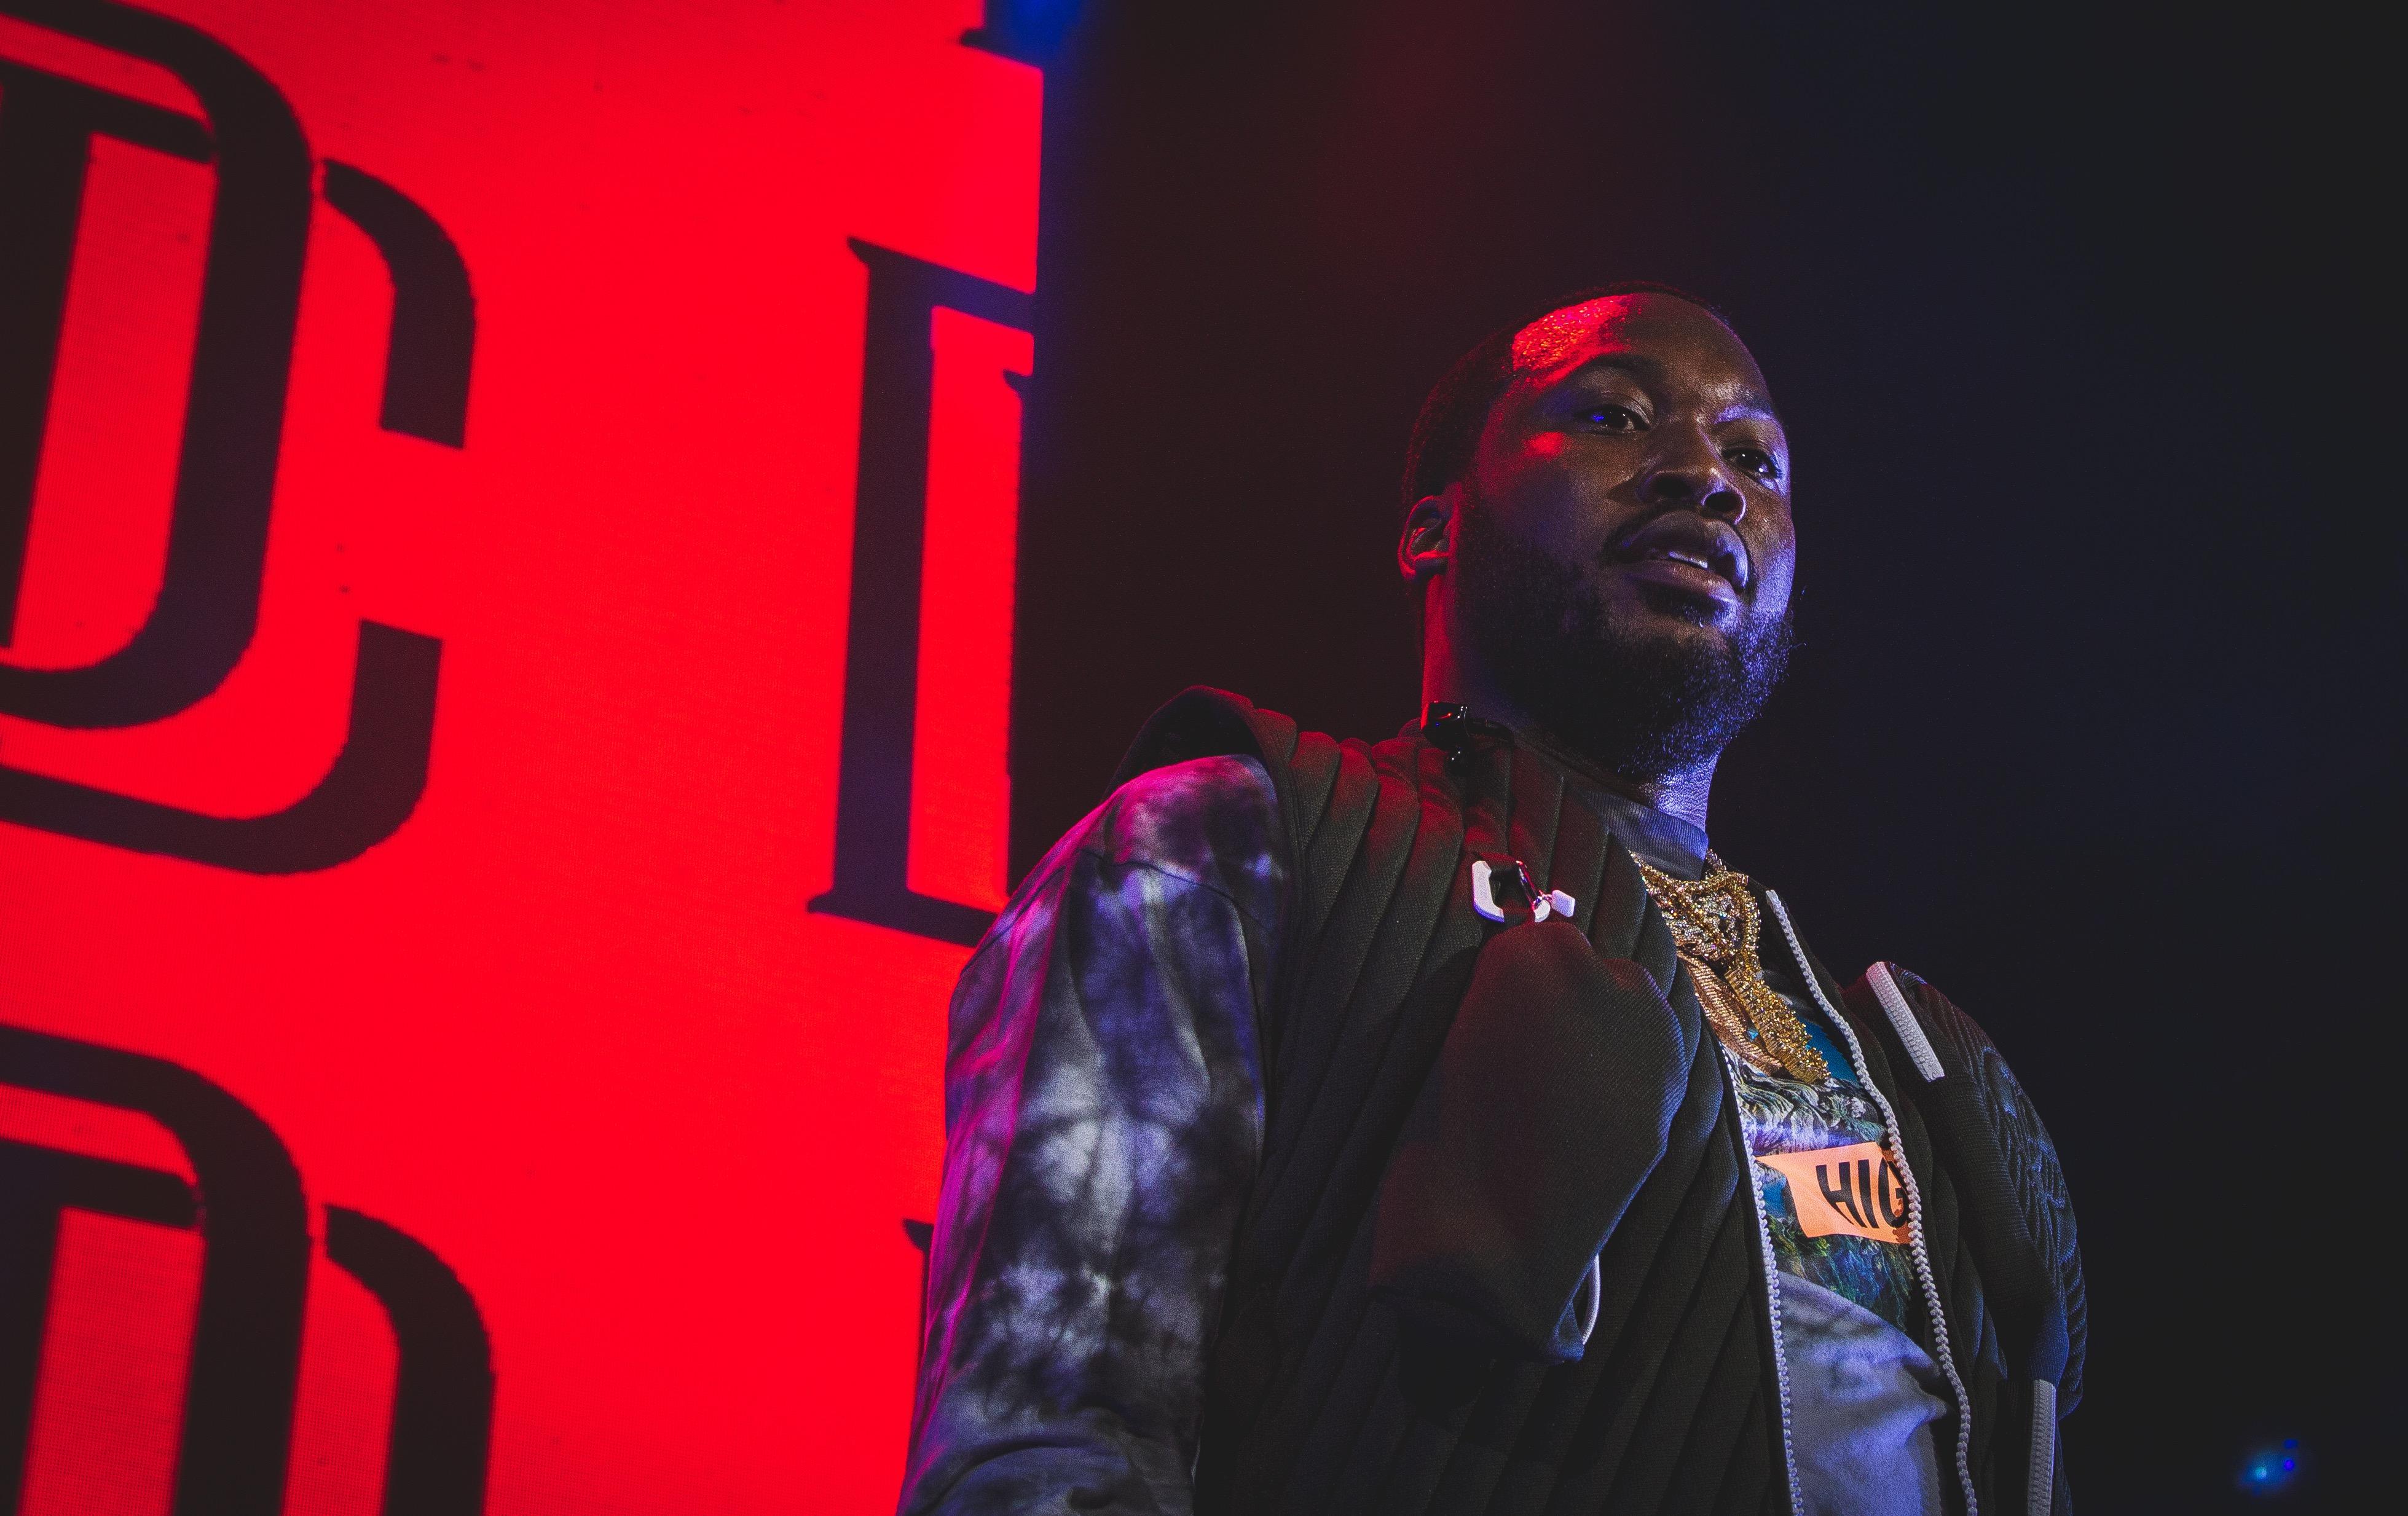 Meek Mill, Lil Baby, Lil Durk & 21 Savage Uniting For New Music Platform